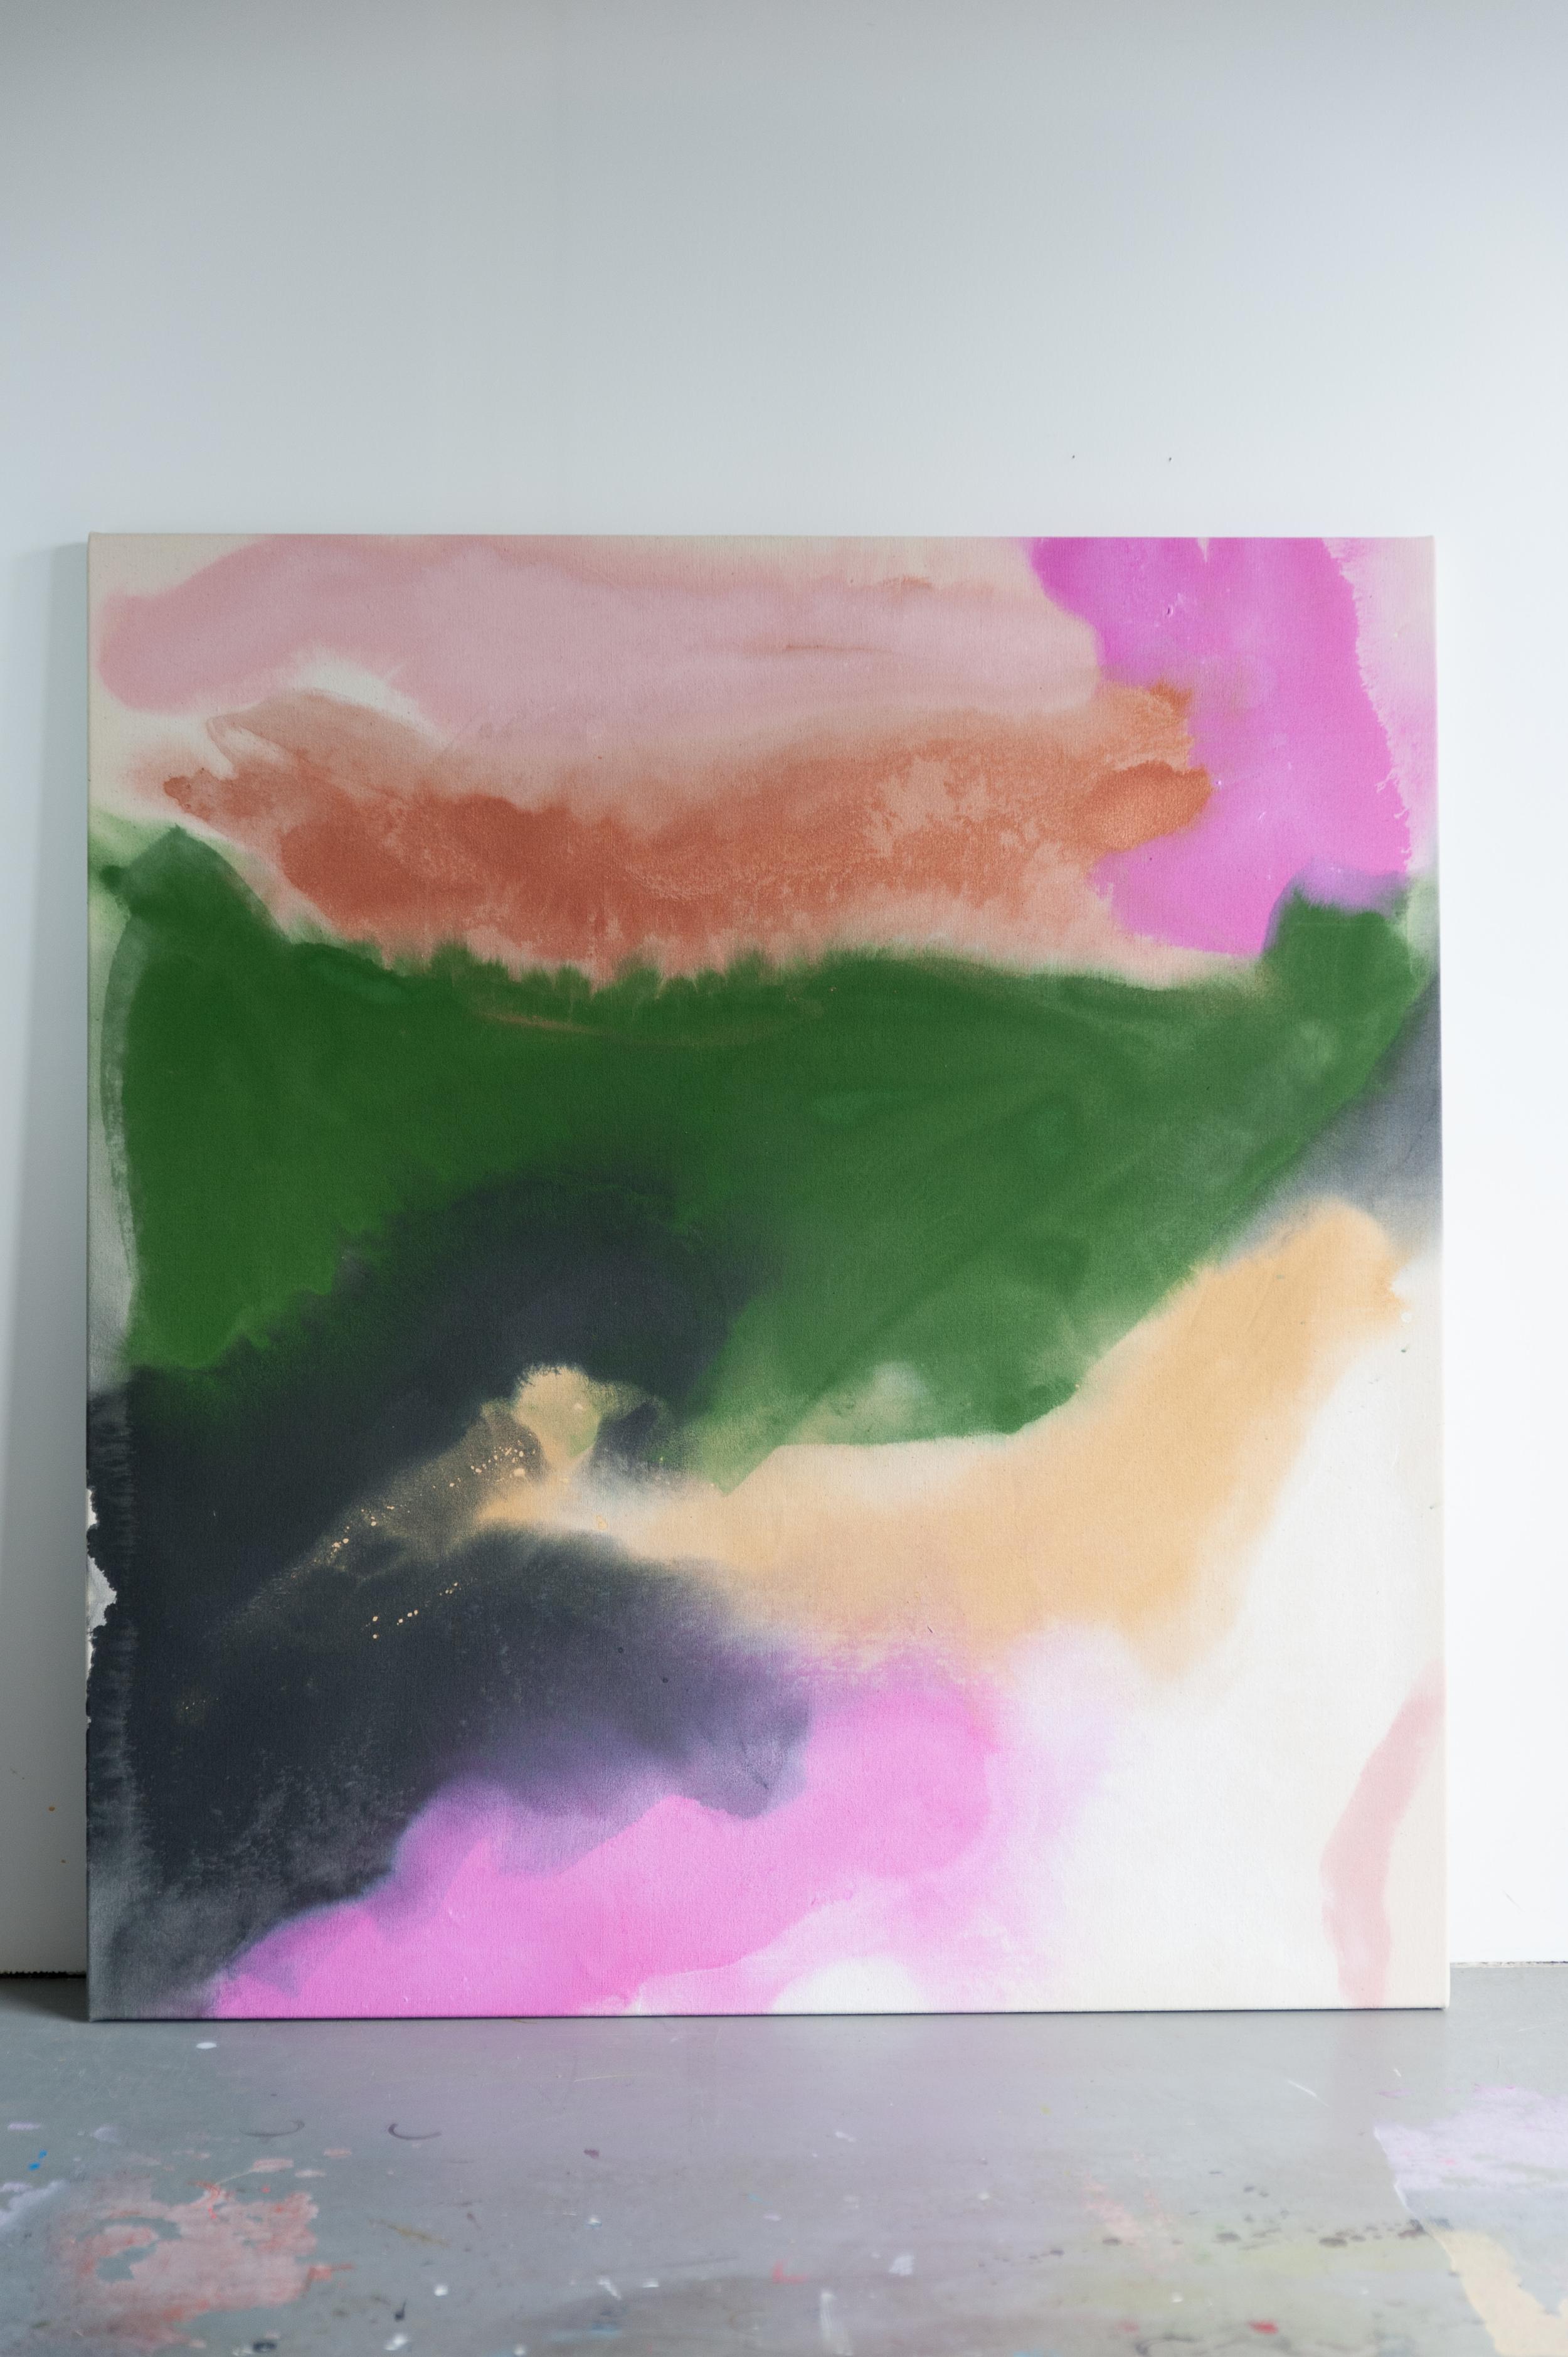 acrylic on raw canvas 44 x 48 inches